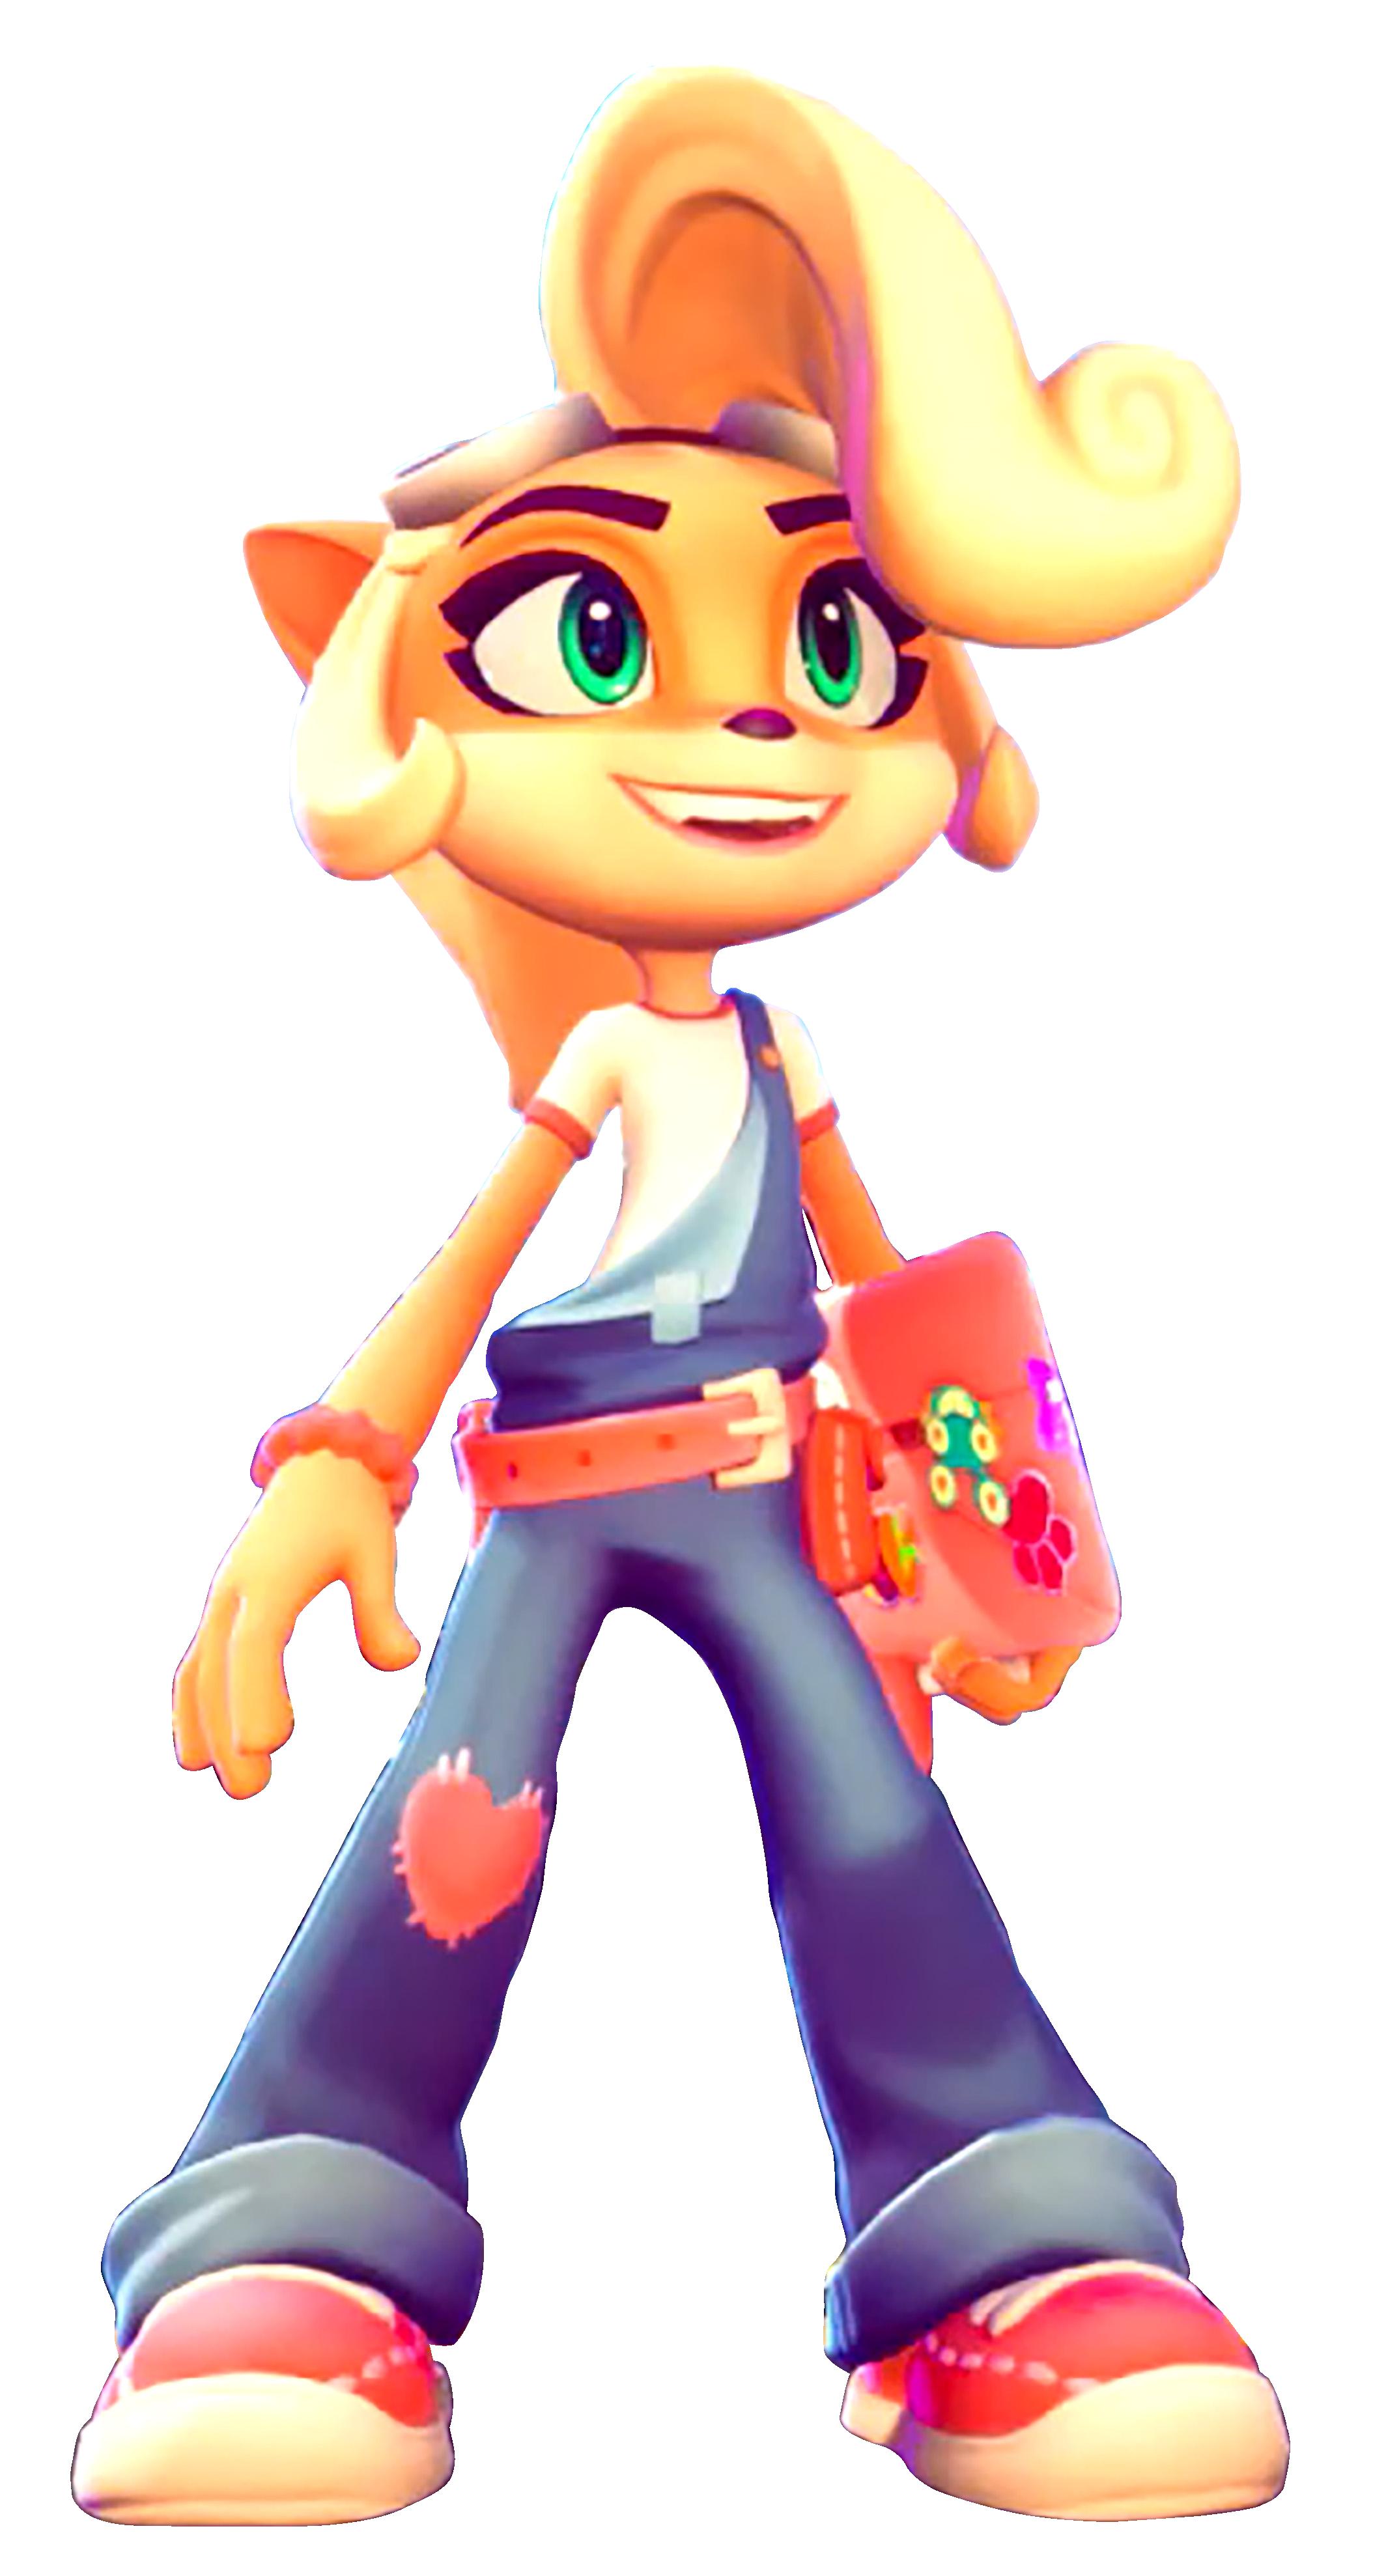 Toys For Bob Era Coco Bandicoot Crash Bandicoot Characters Bandicoot Crash Bandicoot